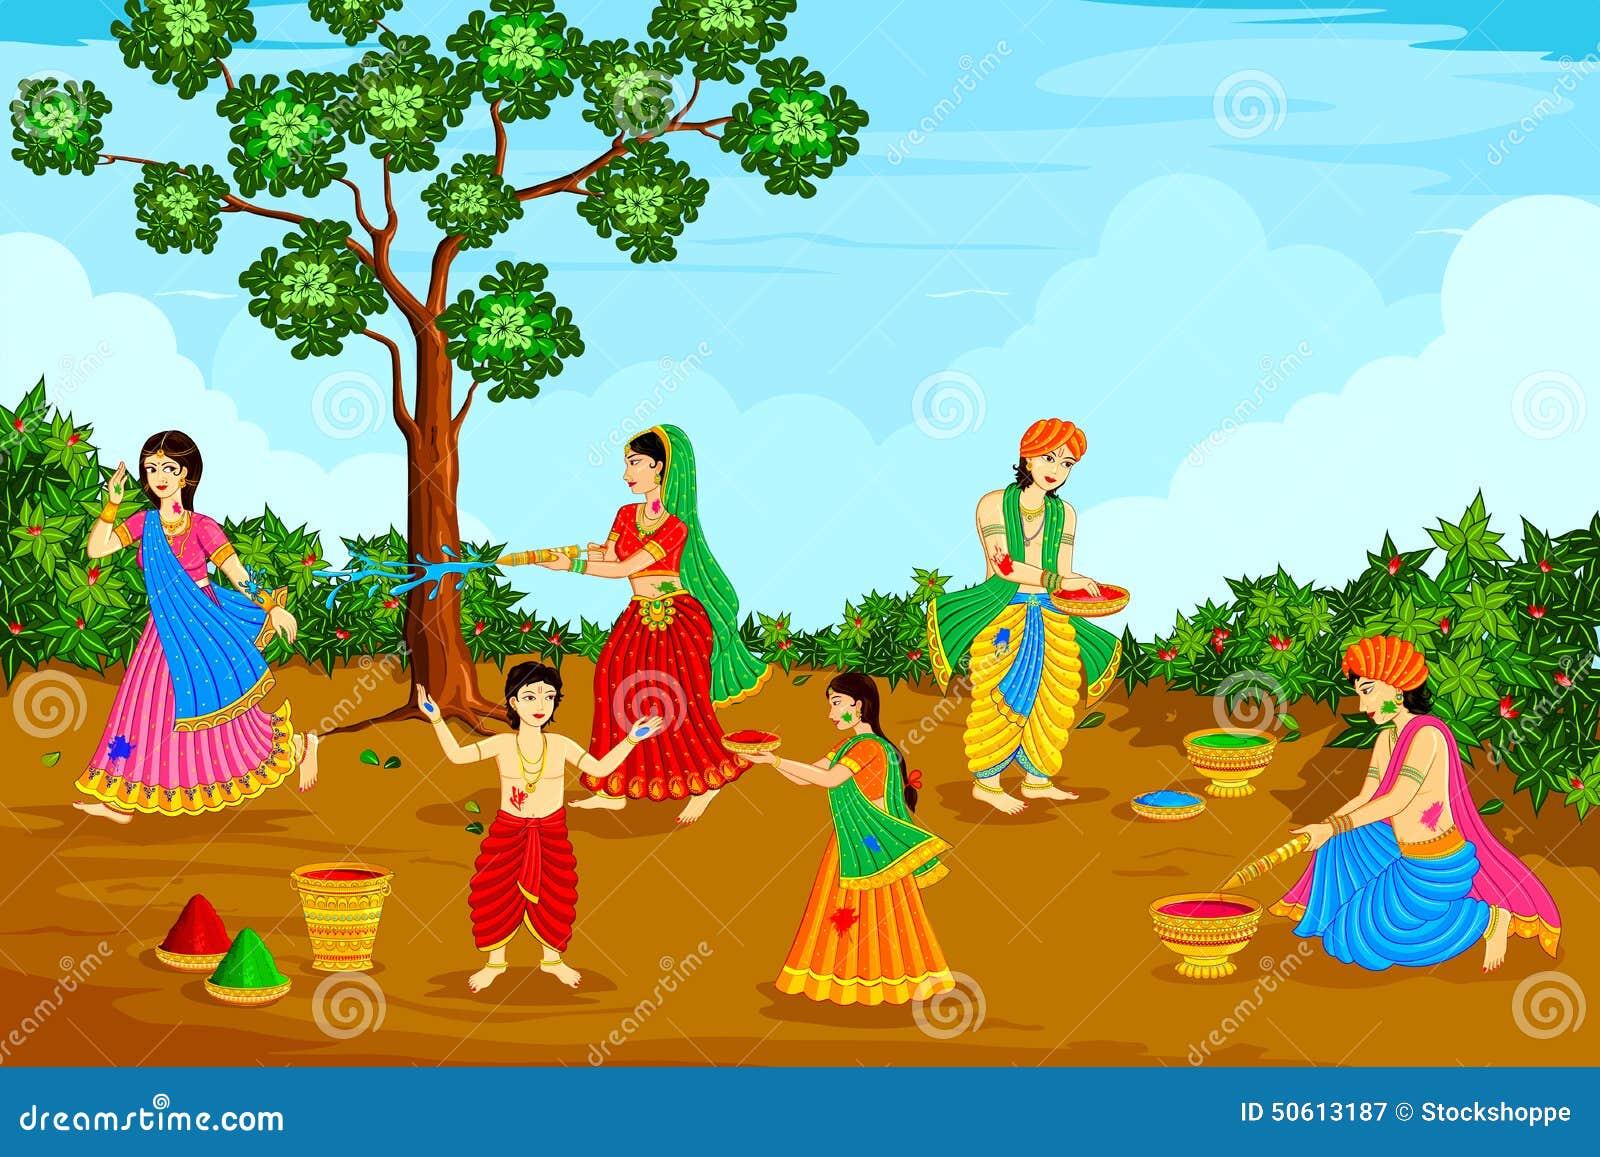 Happy holi radha krishna images - Radha Krishna Playing Holi Royalty Free Stock Photography